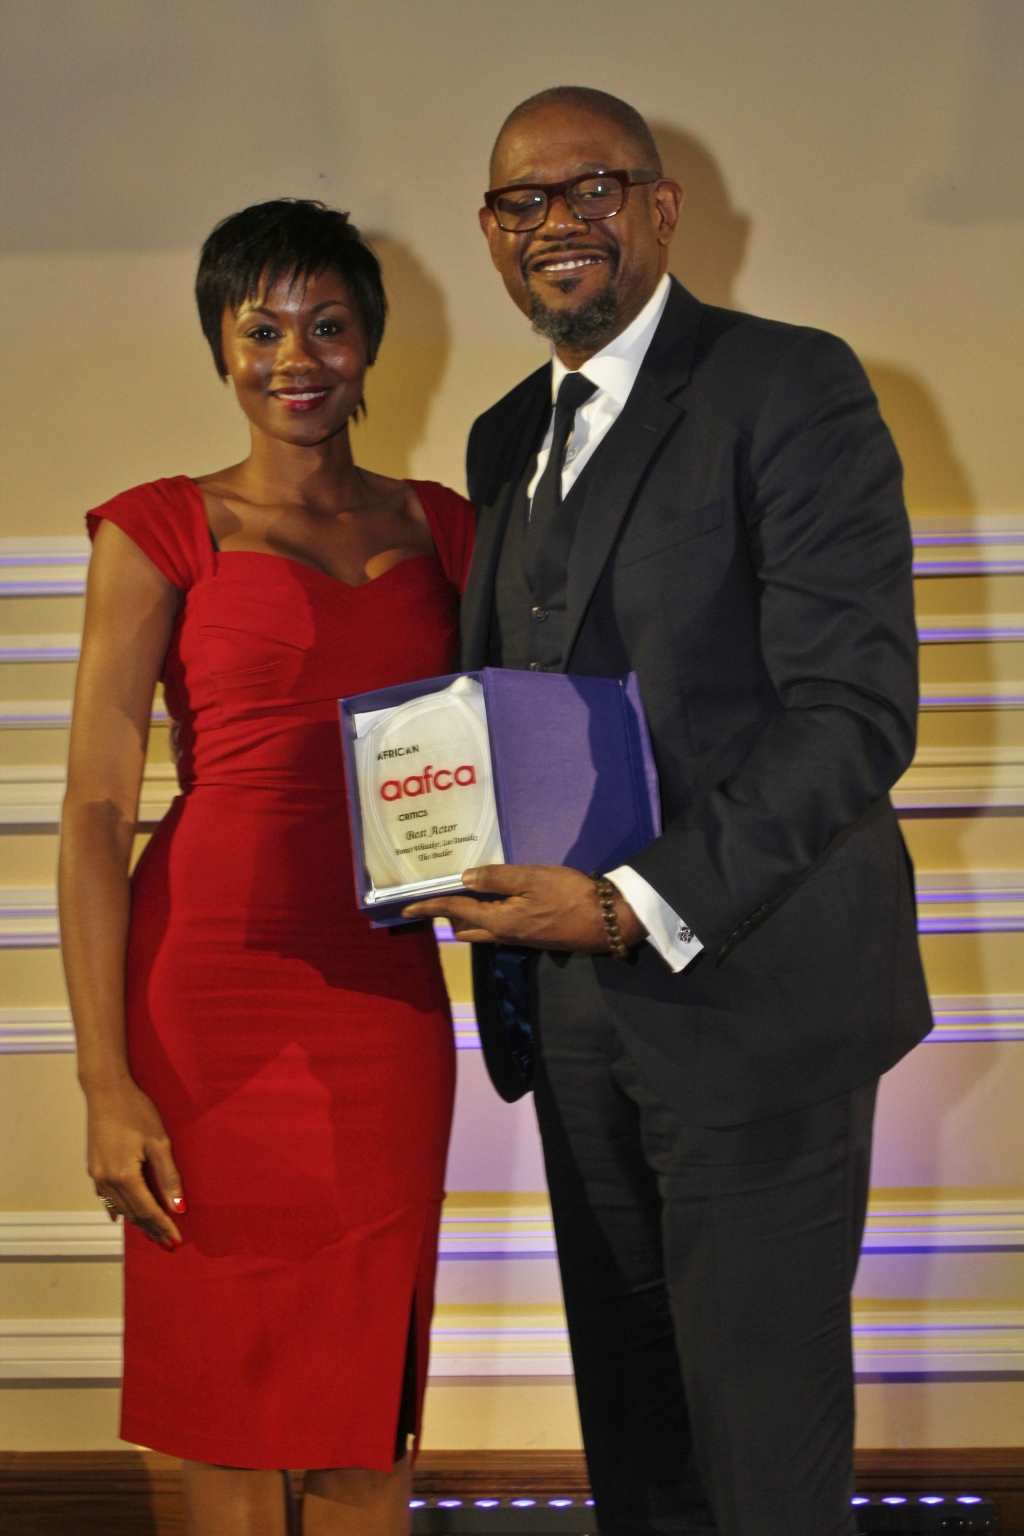 2014 AAFCA AWARDS - Emayatzy Corinealdi  with Forest Whitaker (2)